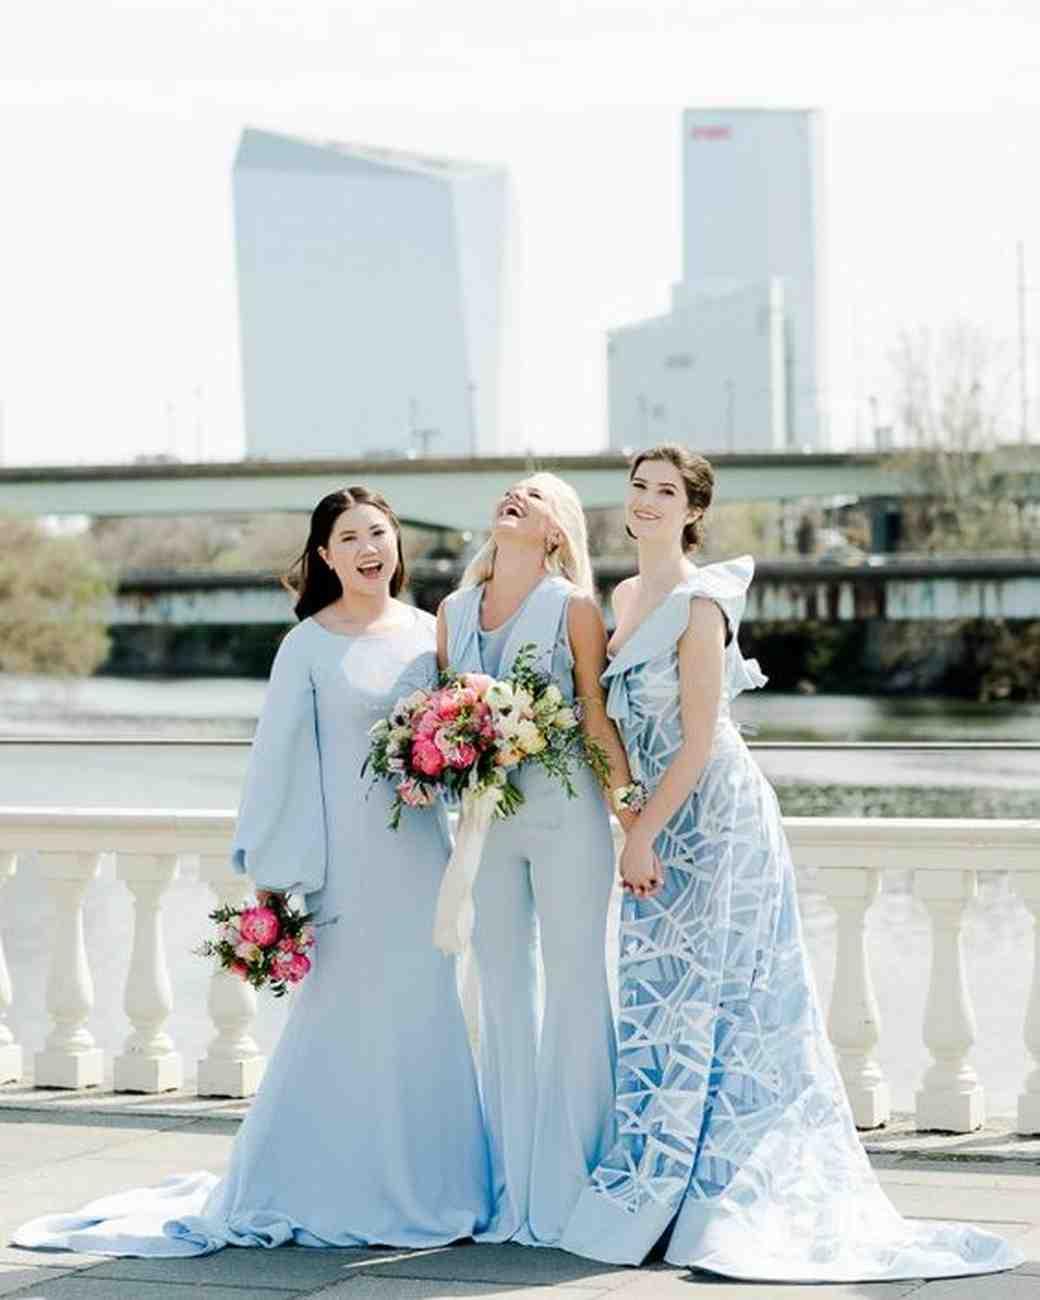 women standing on bridge wearing pale blue bridesmaid dresses and jumpsuit